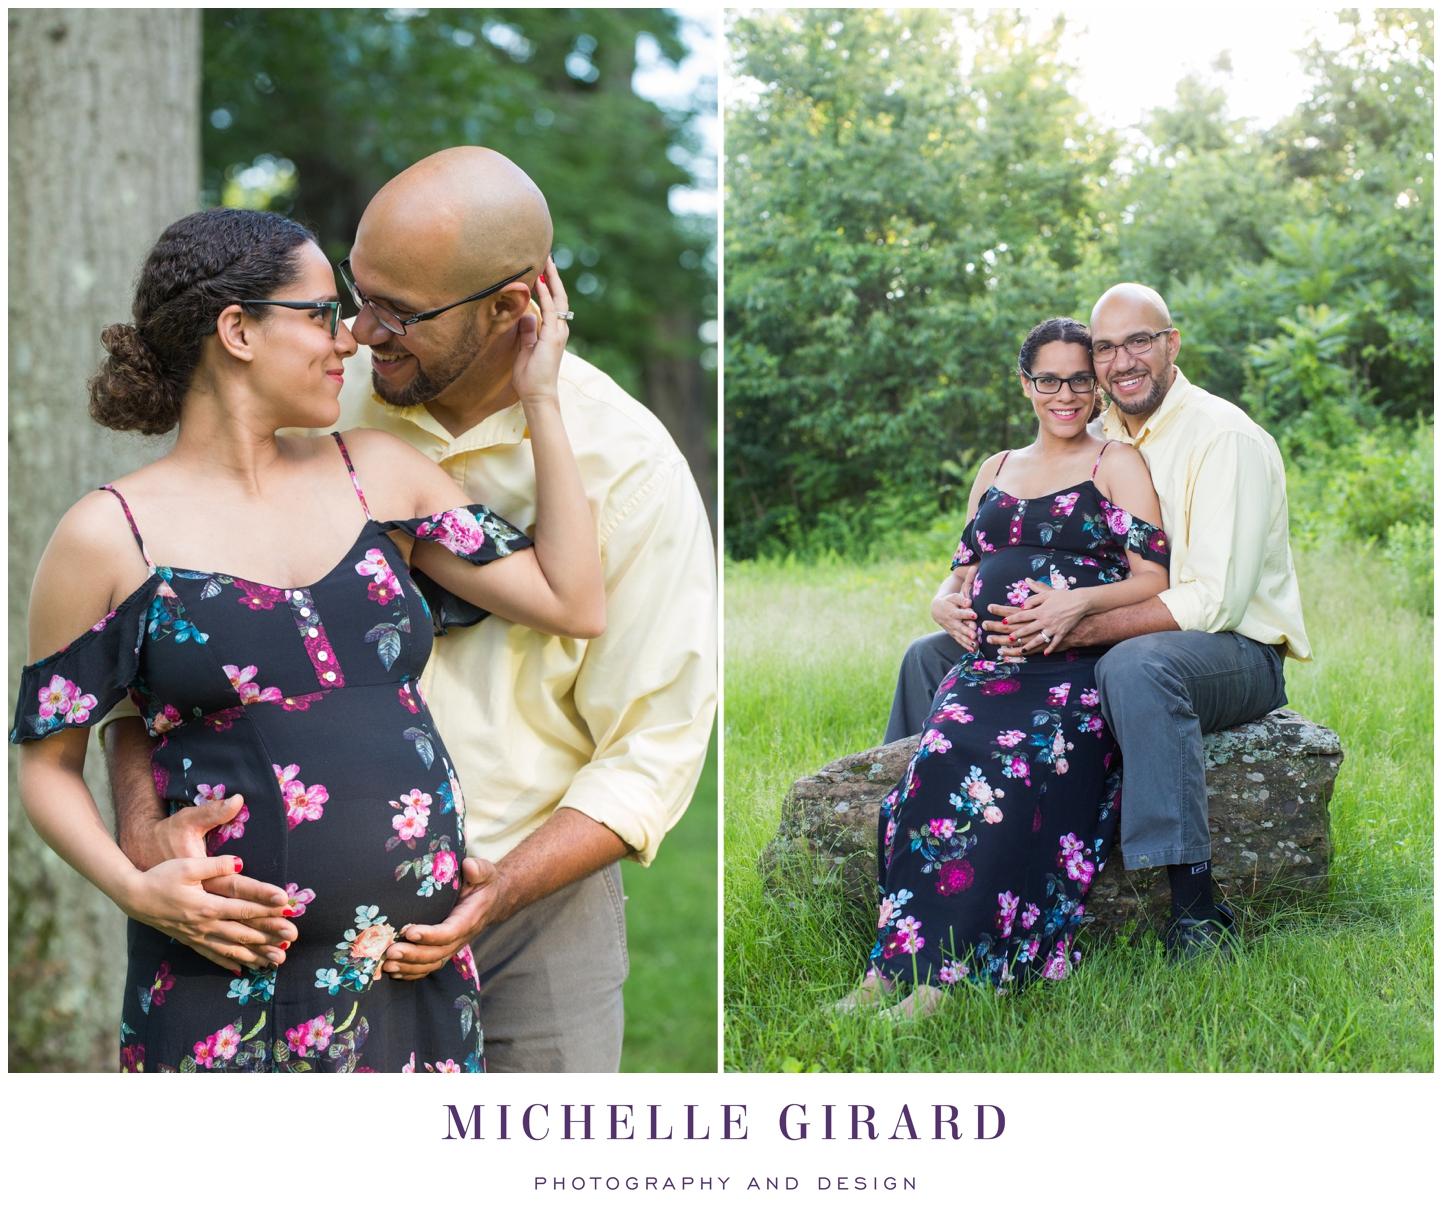 MaternitySession_BabyBump_MichelleGirardPhotography06.jpg